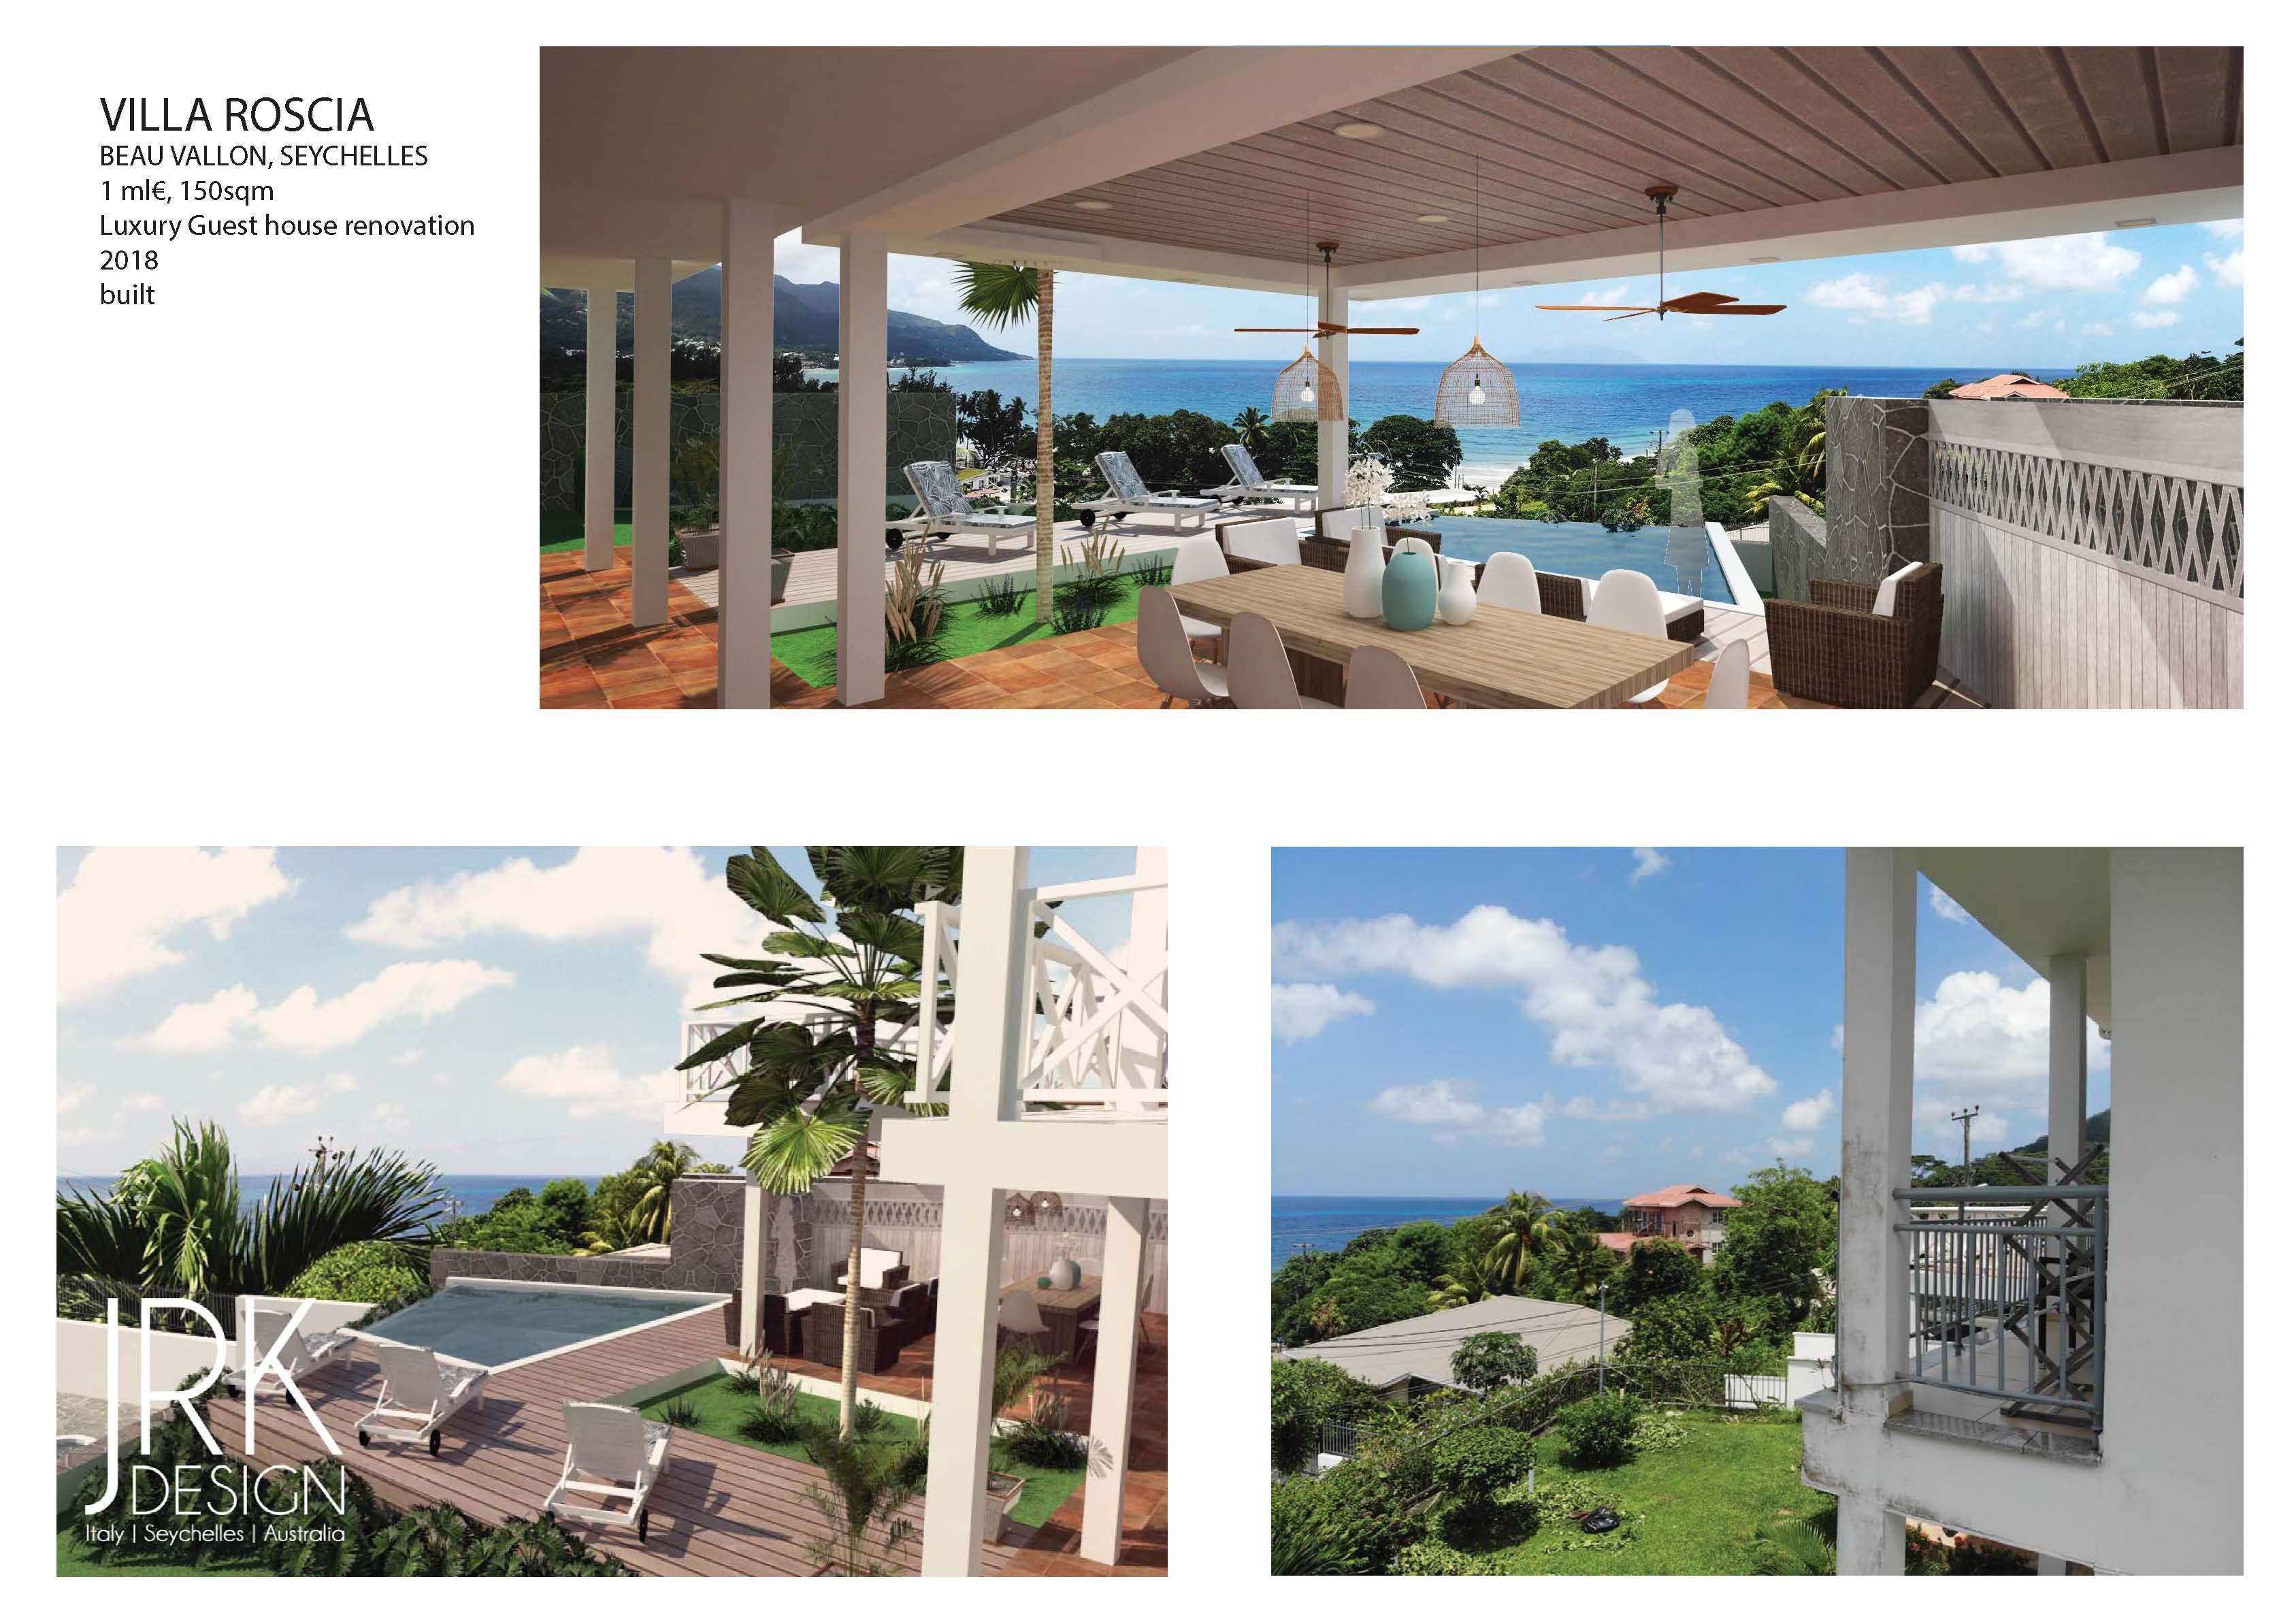 Villa Roscia Guest house